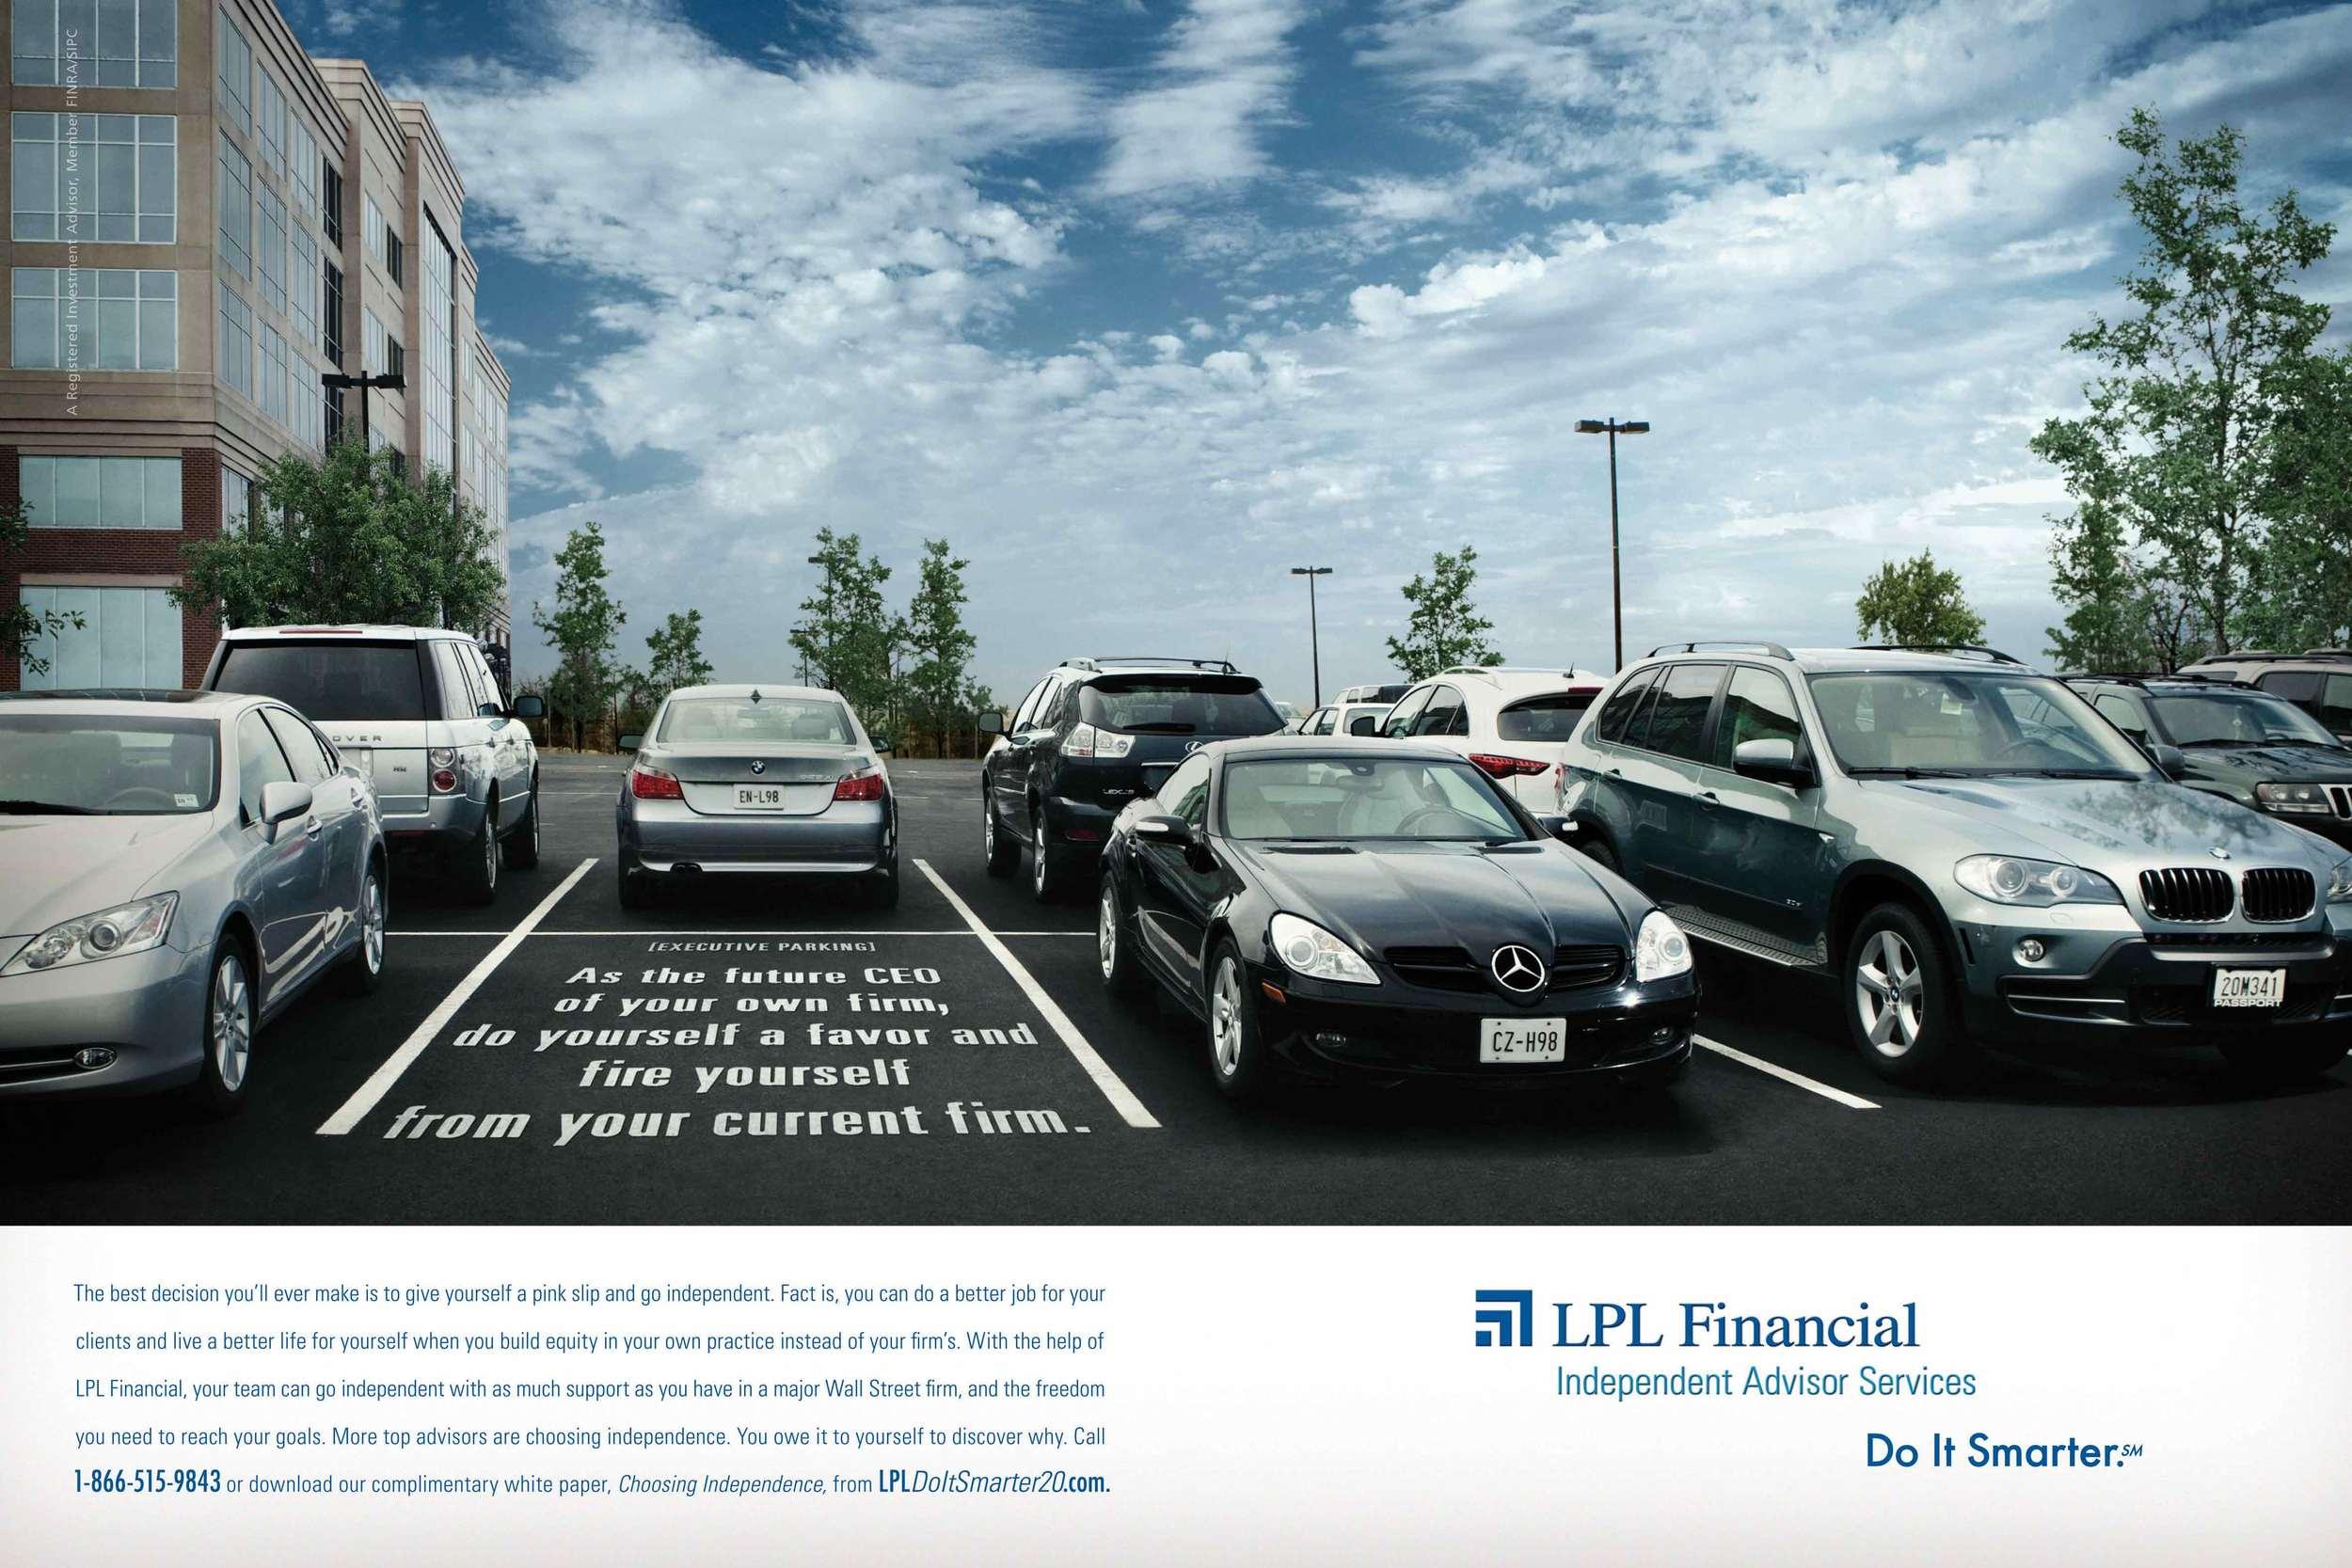 LPL_ParkingLot_HR.jpg